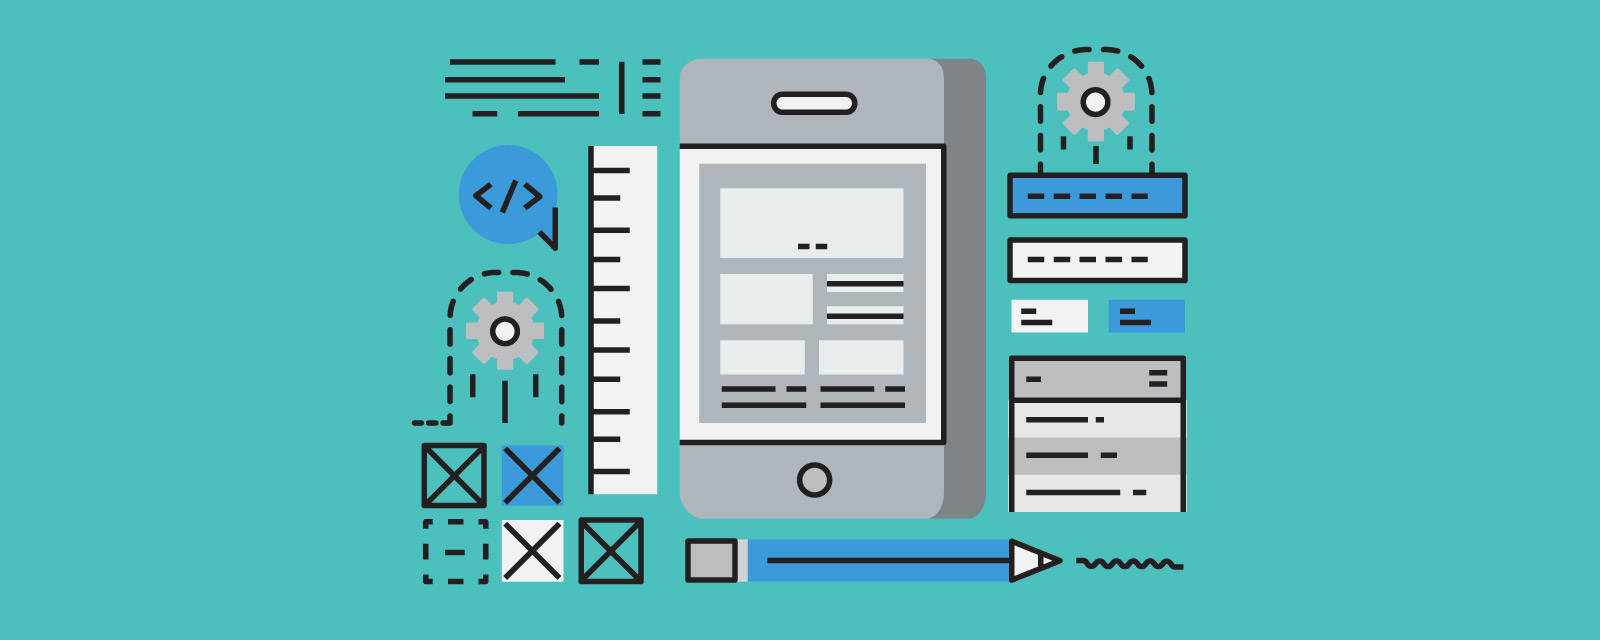 Mobile-First-B2B-Website-Design